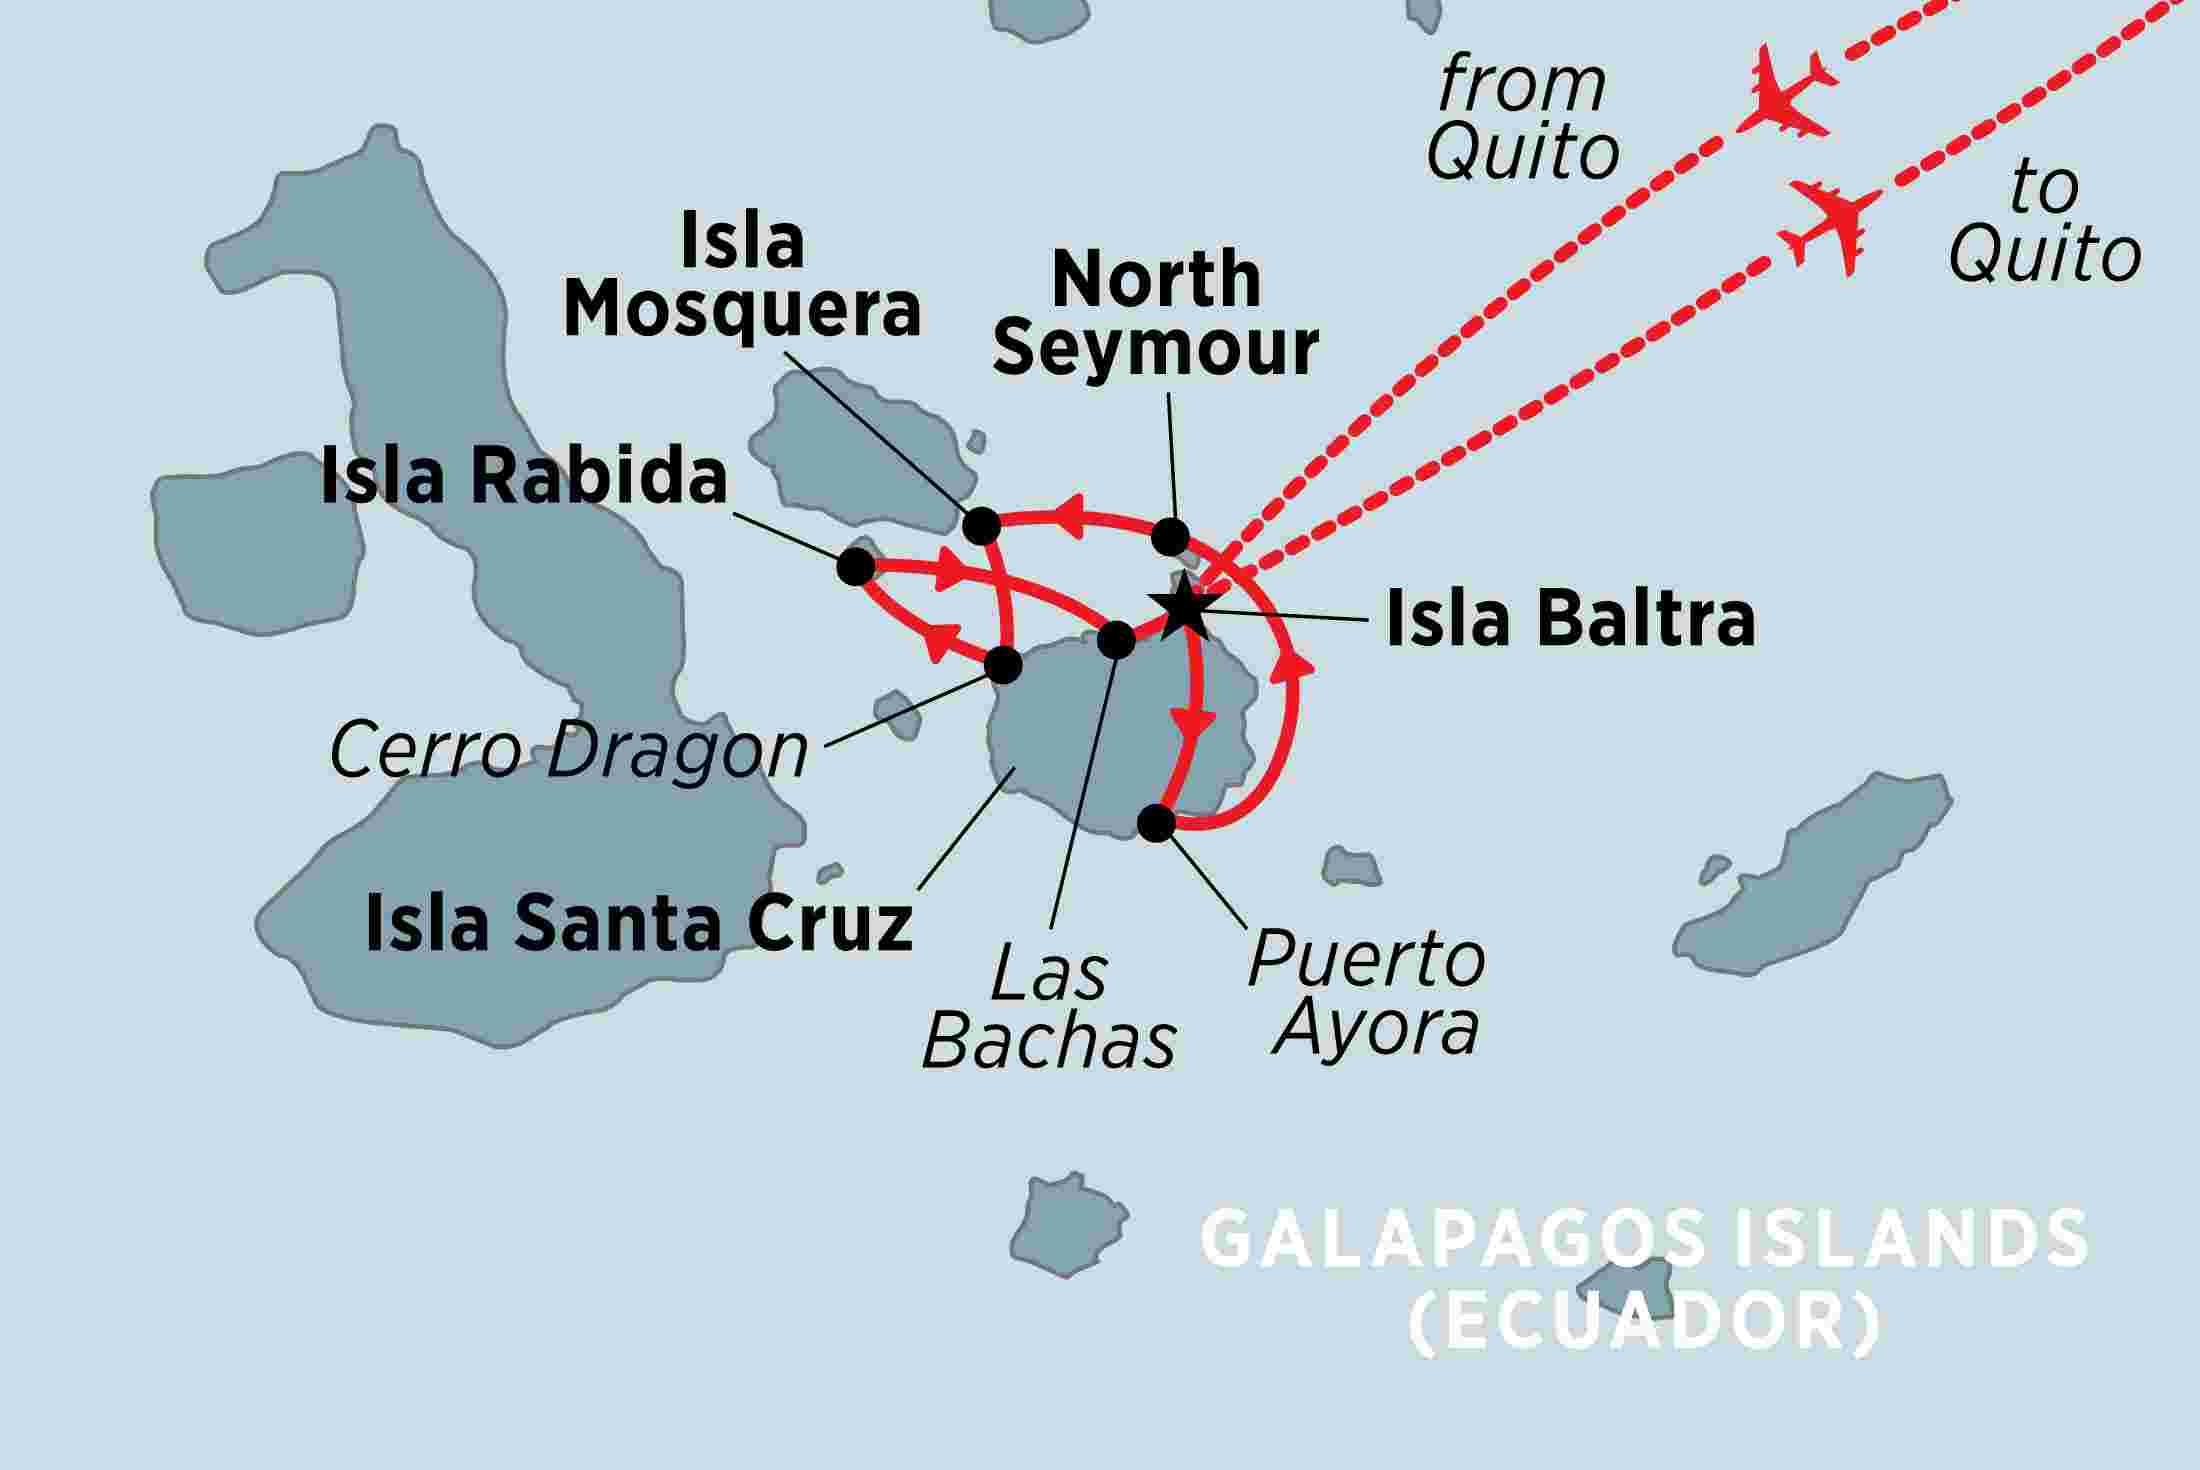 Galapagos Islands Tours, Travel & Trips | Peregrine ... on caribbean map, maldives map, central america map, genovesa island, luxembourg map, pinta island, honduras map, puerto ayora map, madagascar map, nameless island, bahamas map, africa map, puerto ayora, bay of fundy, atacama map, ha long bay, baltra island, isabela island, peru map, fernandina island, puerto baquerizo moreno, galapagos national park, tierra del fuego on map, charles darwin research station, netherlands antilles map, greater antilles map, iguazu falls, ethiopia map, cocos islands, strait of magellan map, europe map, dominican republic map, aleutian islands map, iceland islands map,